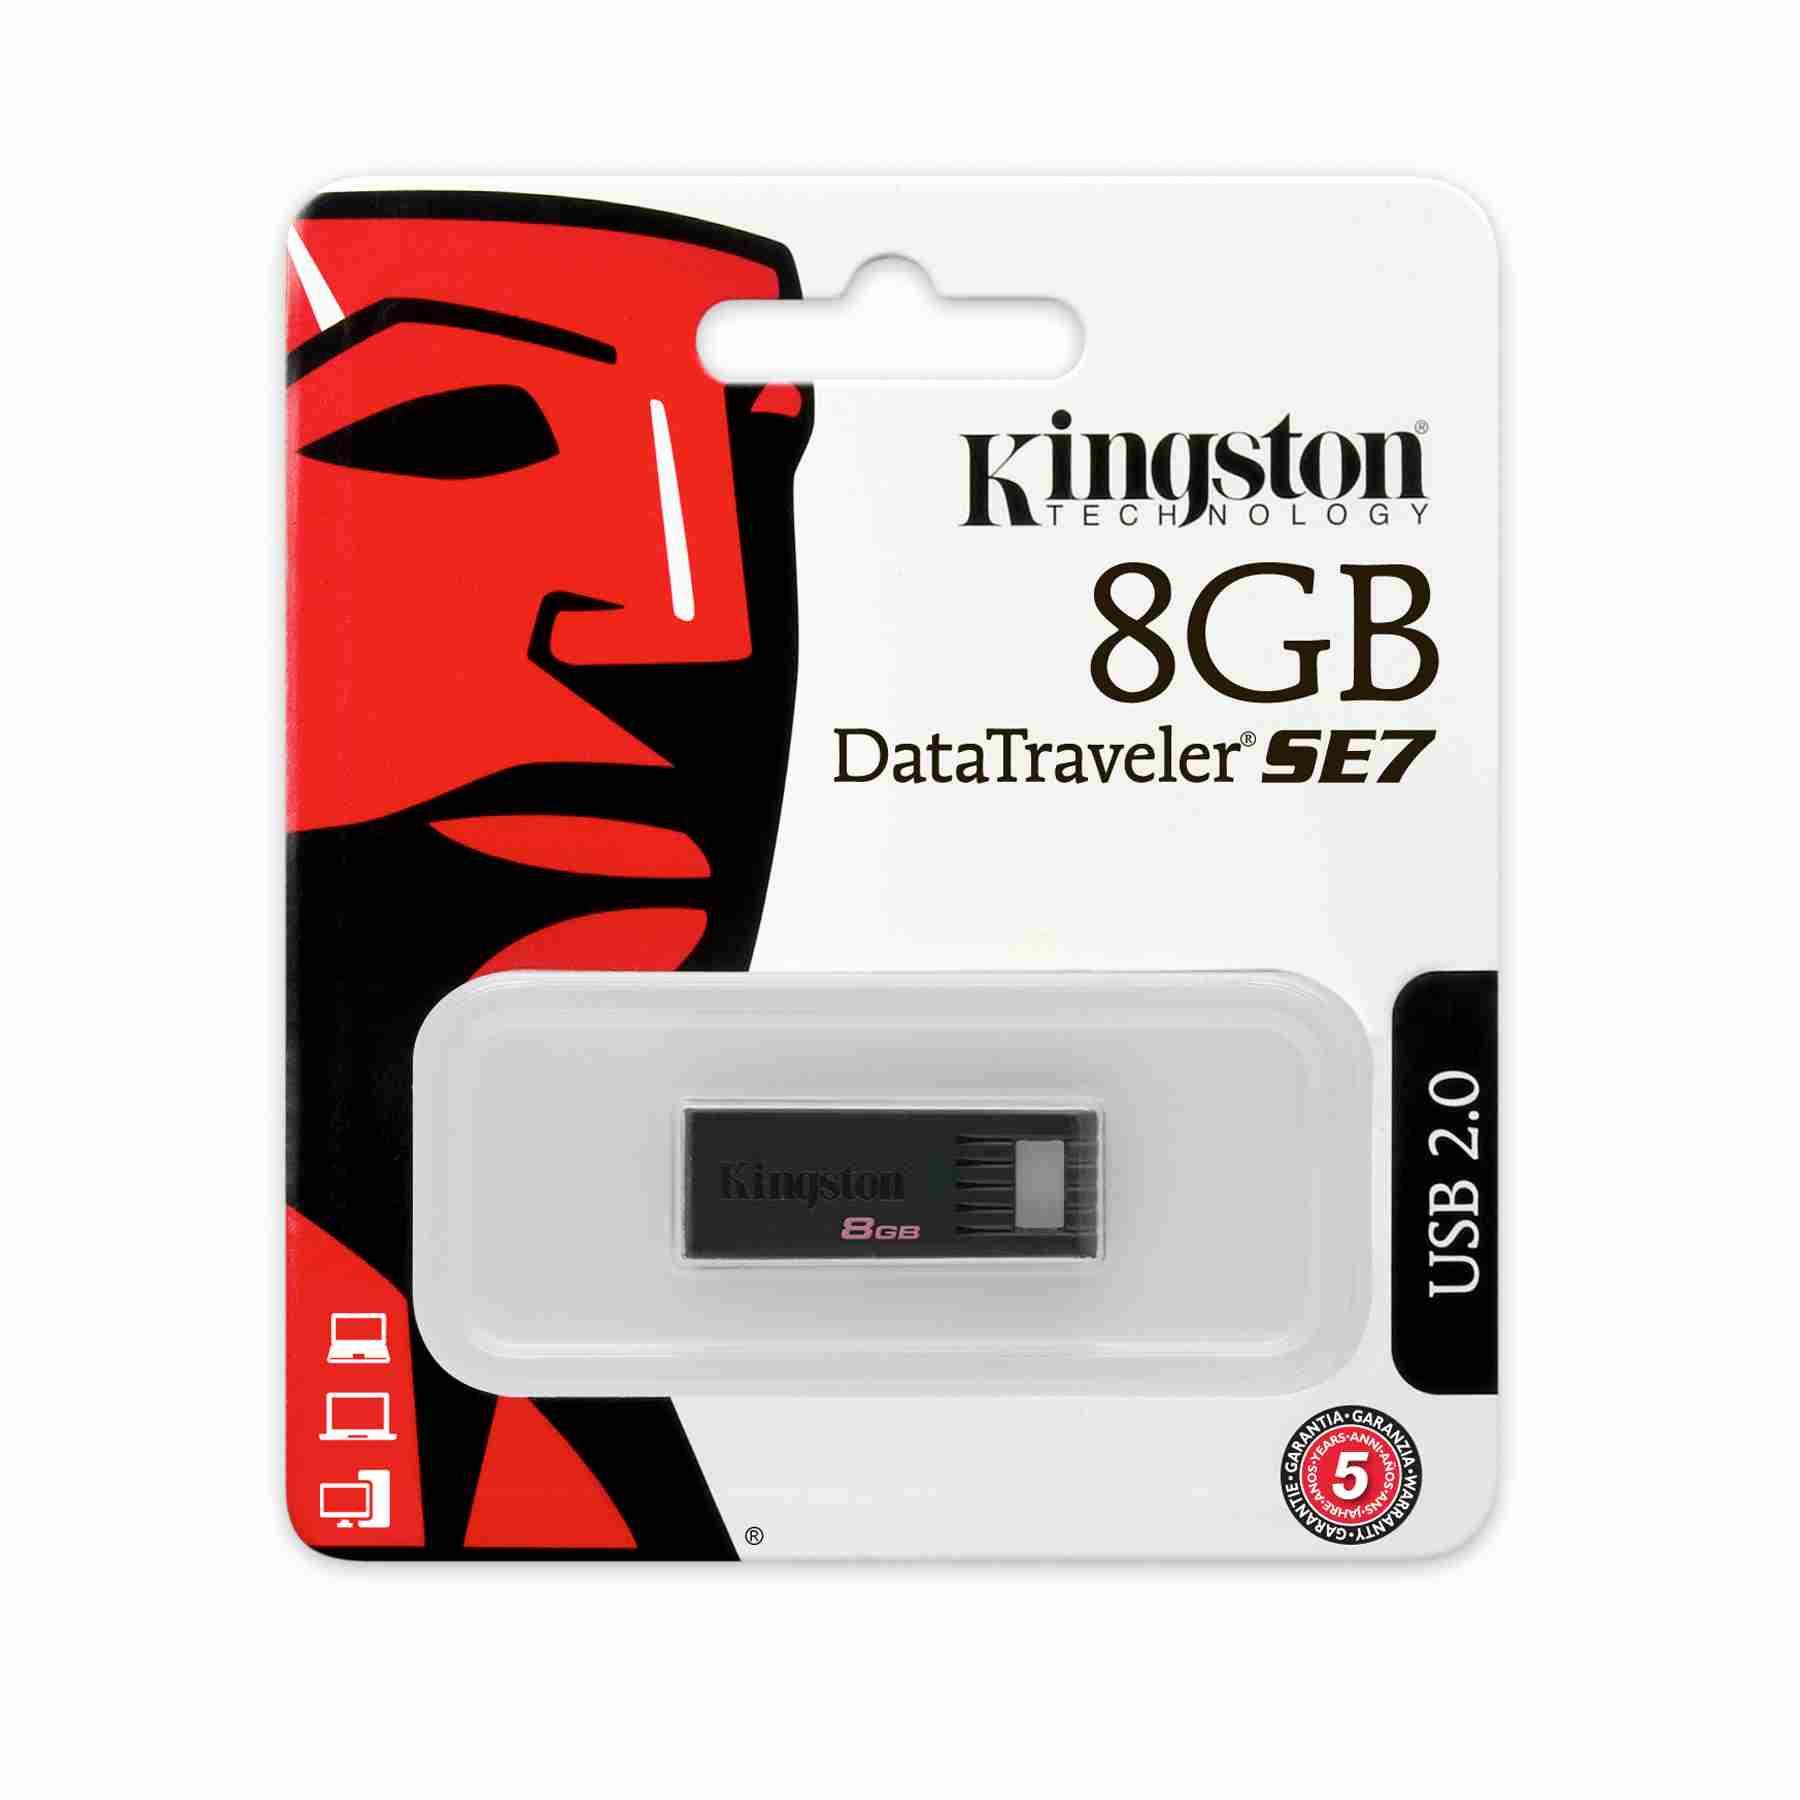 BSTORE MEMORIA KINGSTON 8GB DTSE7